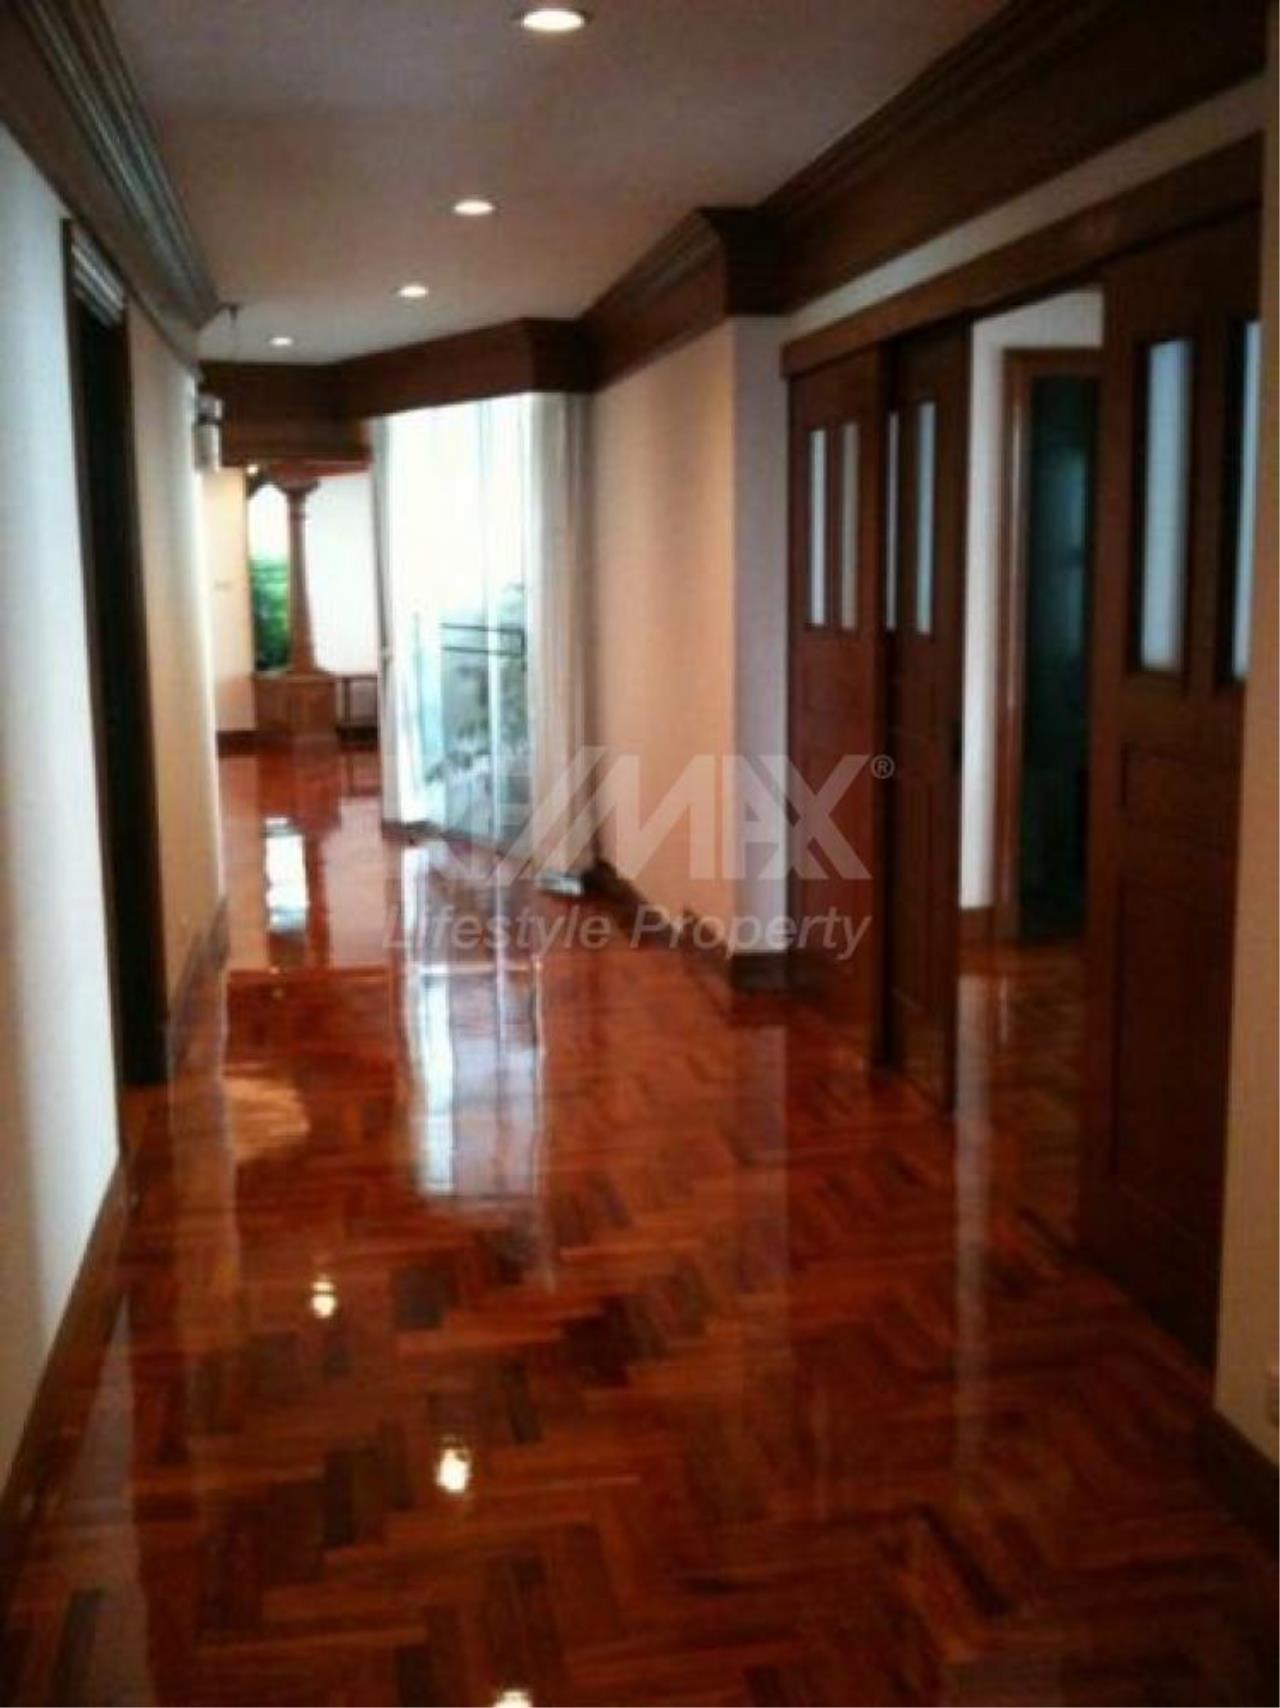 RE/MAX LifeStyle Property Agency's Raj Mansion 4